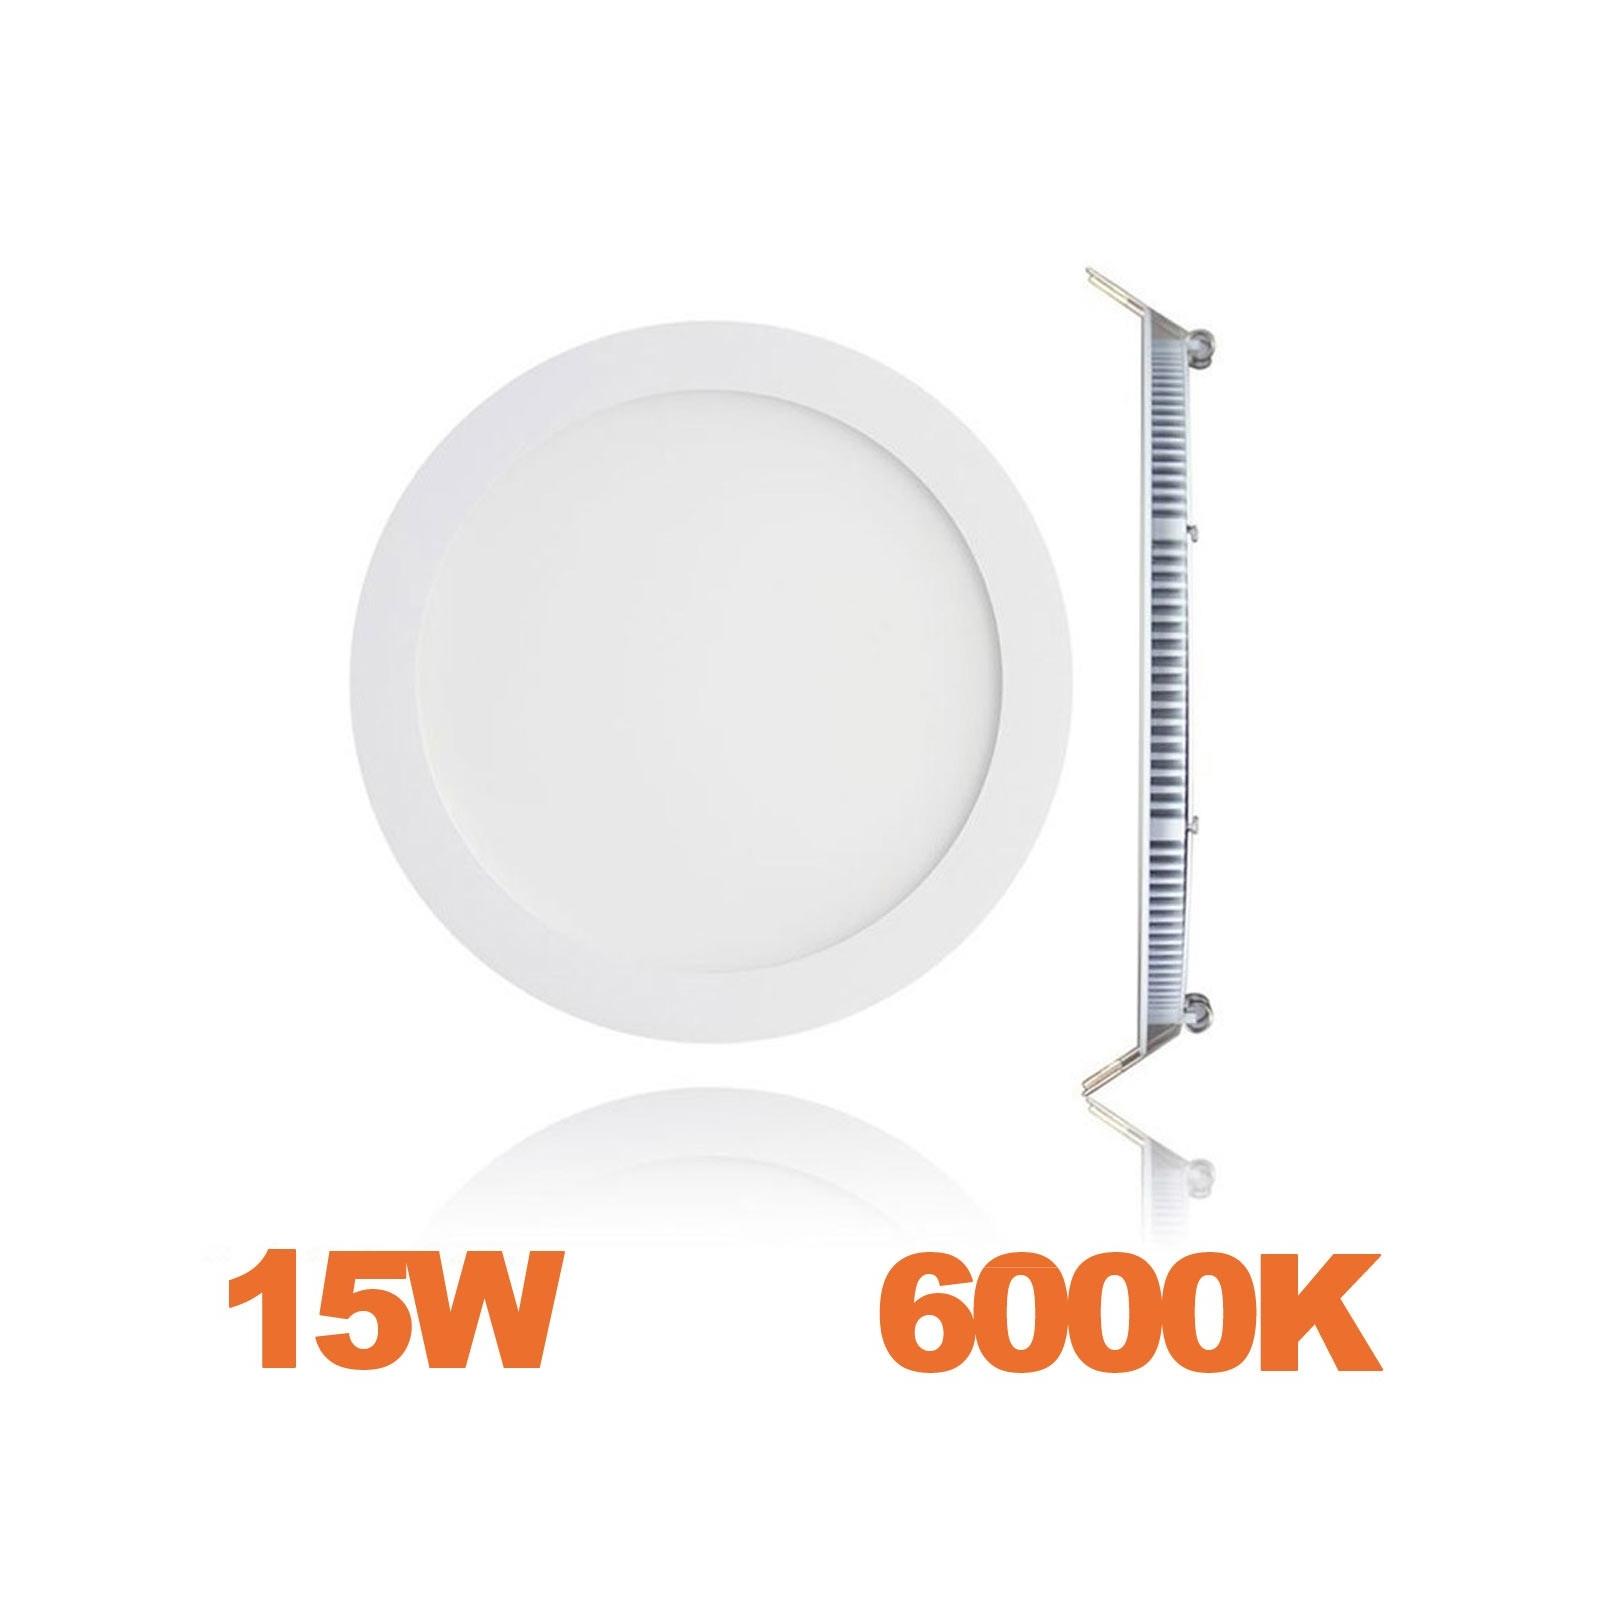 spot encastrable led downlight panel extra plat 15w blanc froid 6000k